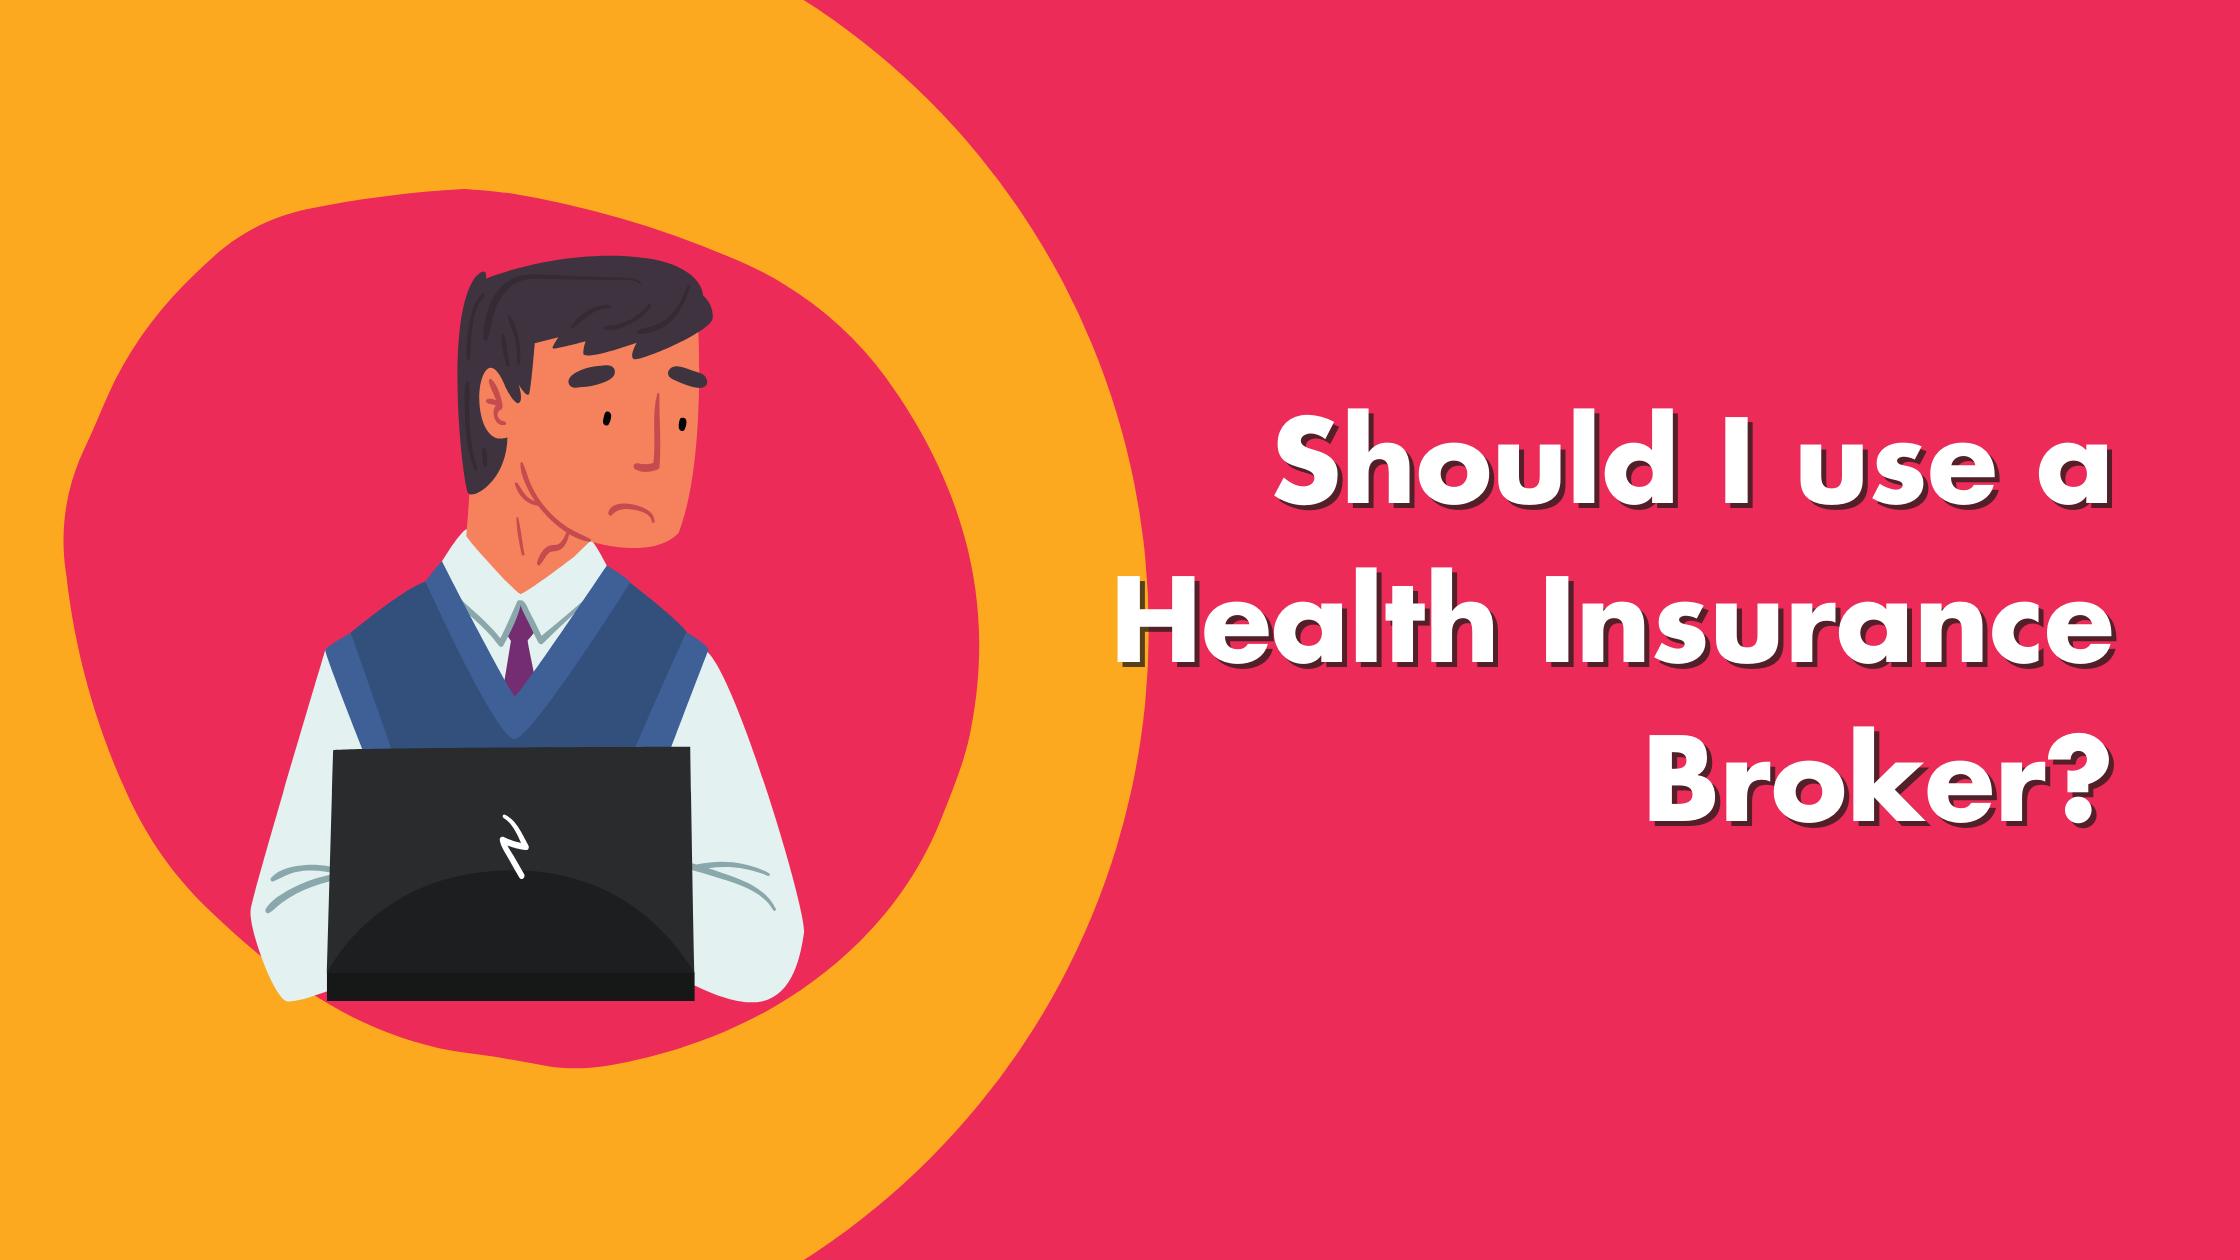 Should I Use A Health Insurance Broker